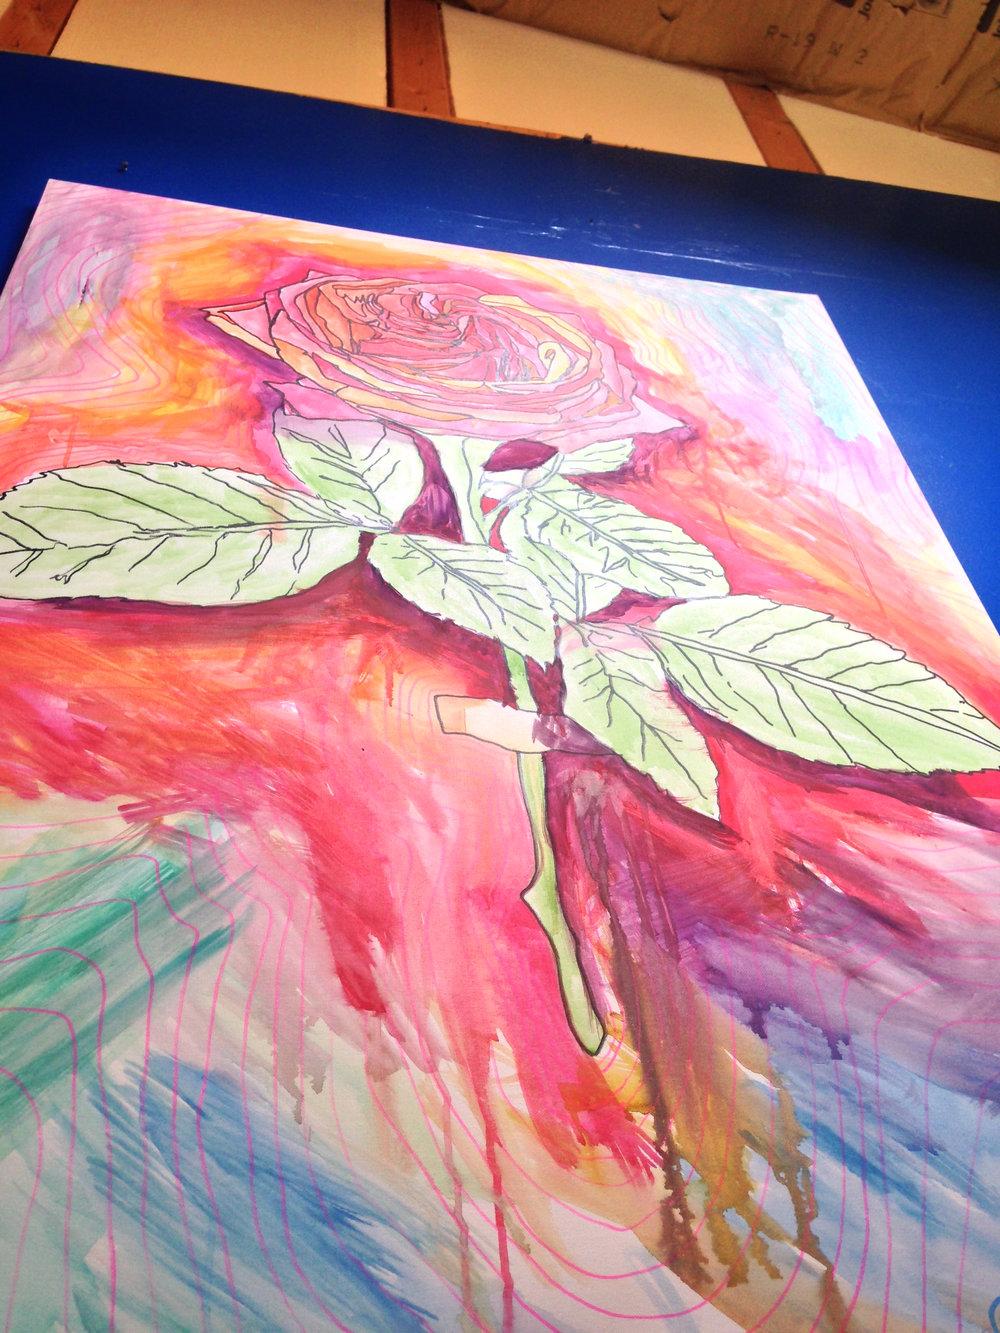 - David Brookton art hanging at The Grow Den (Denver, CO)